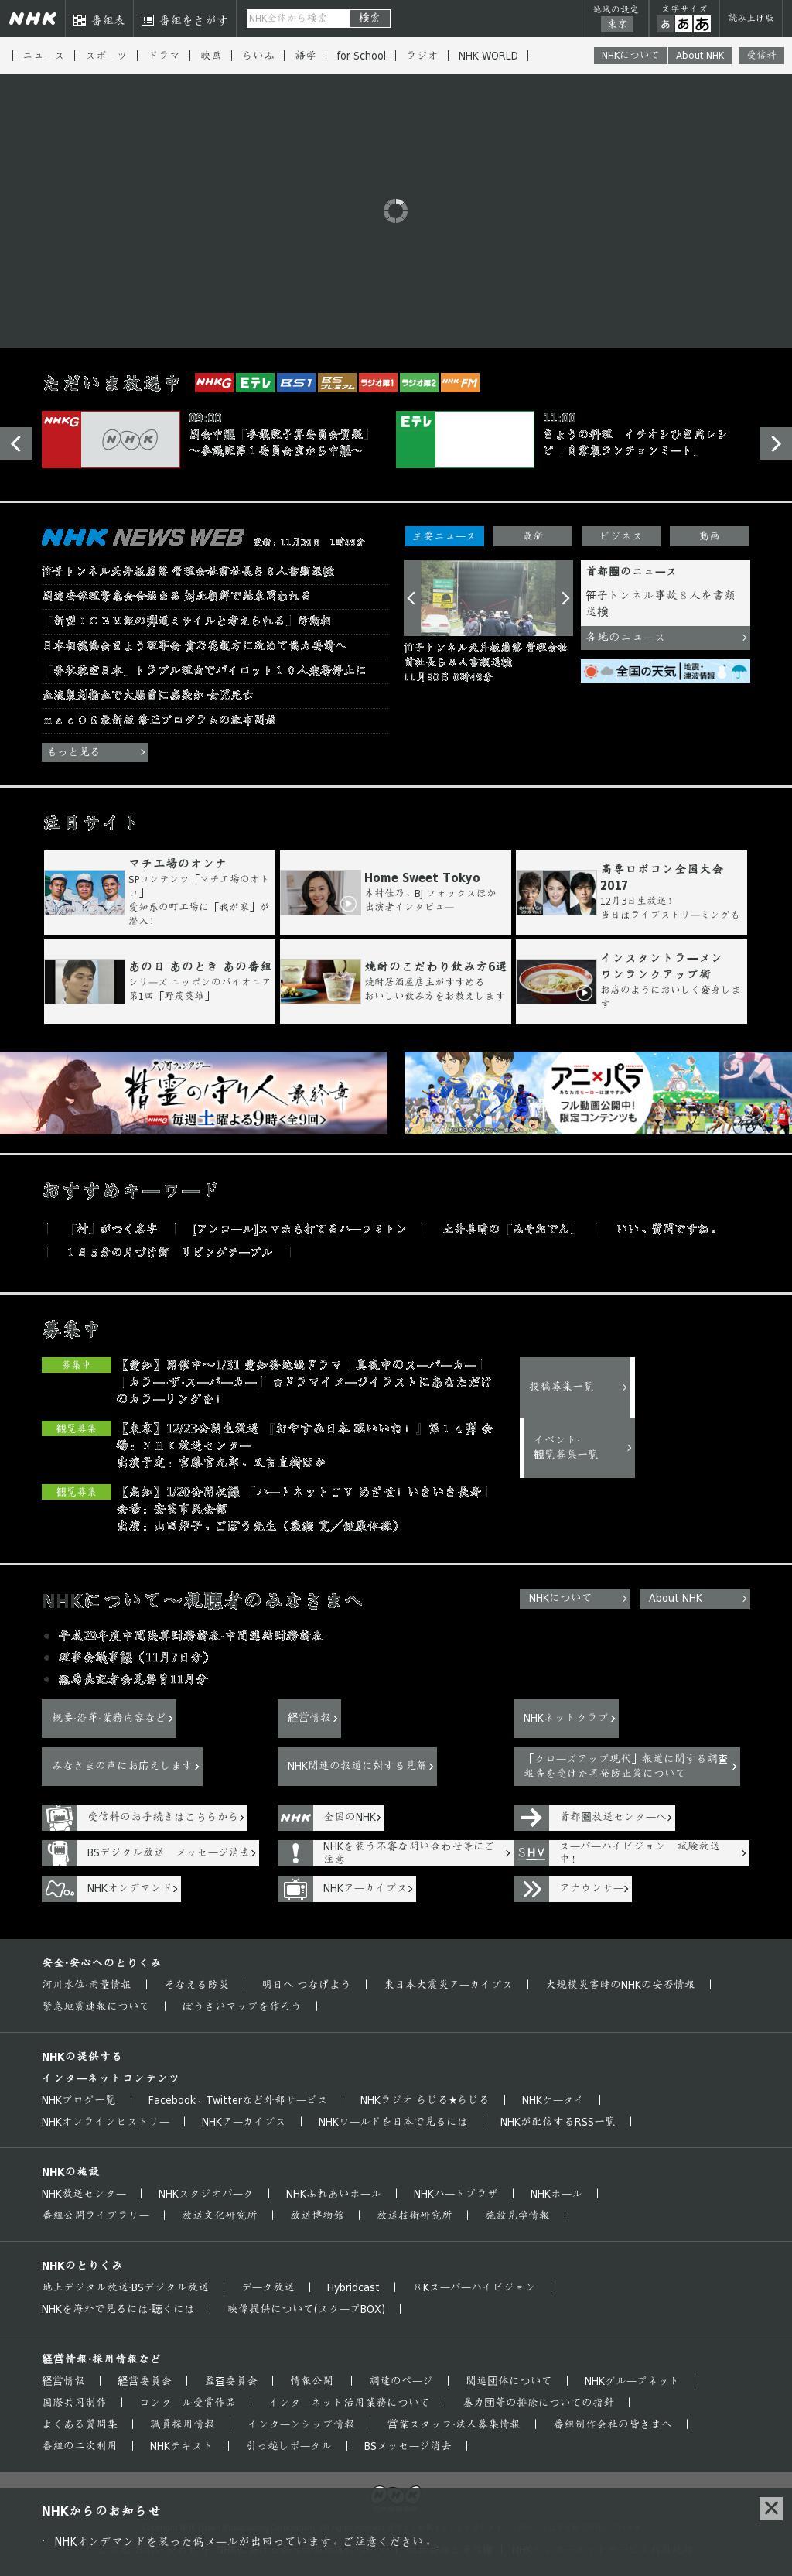 NHK Online at Friday Feb. 2, 2018, 4:14 p.m. UTC